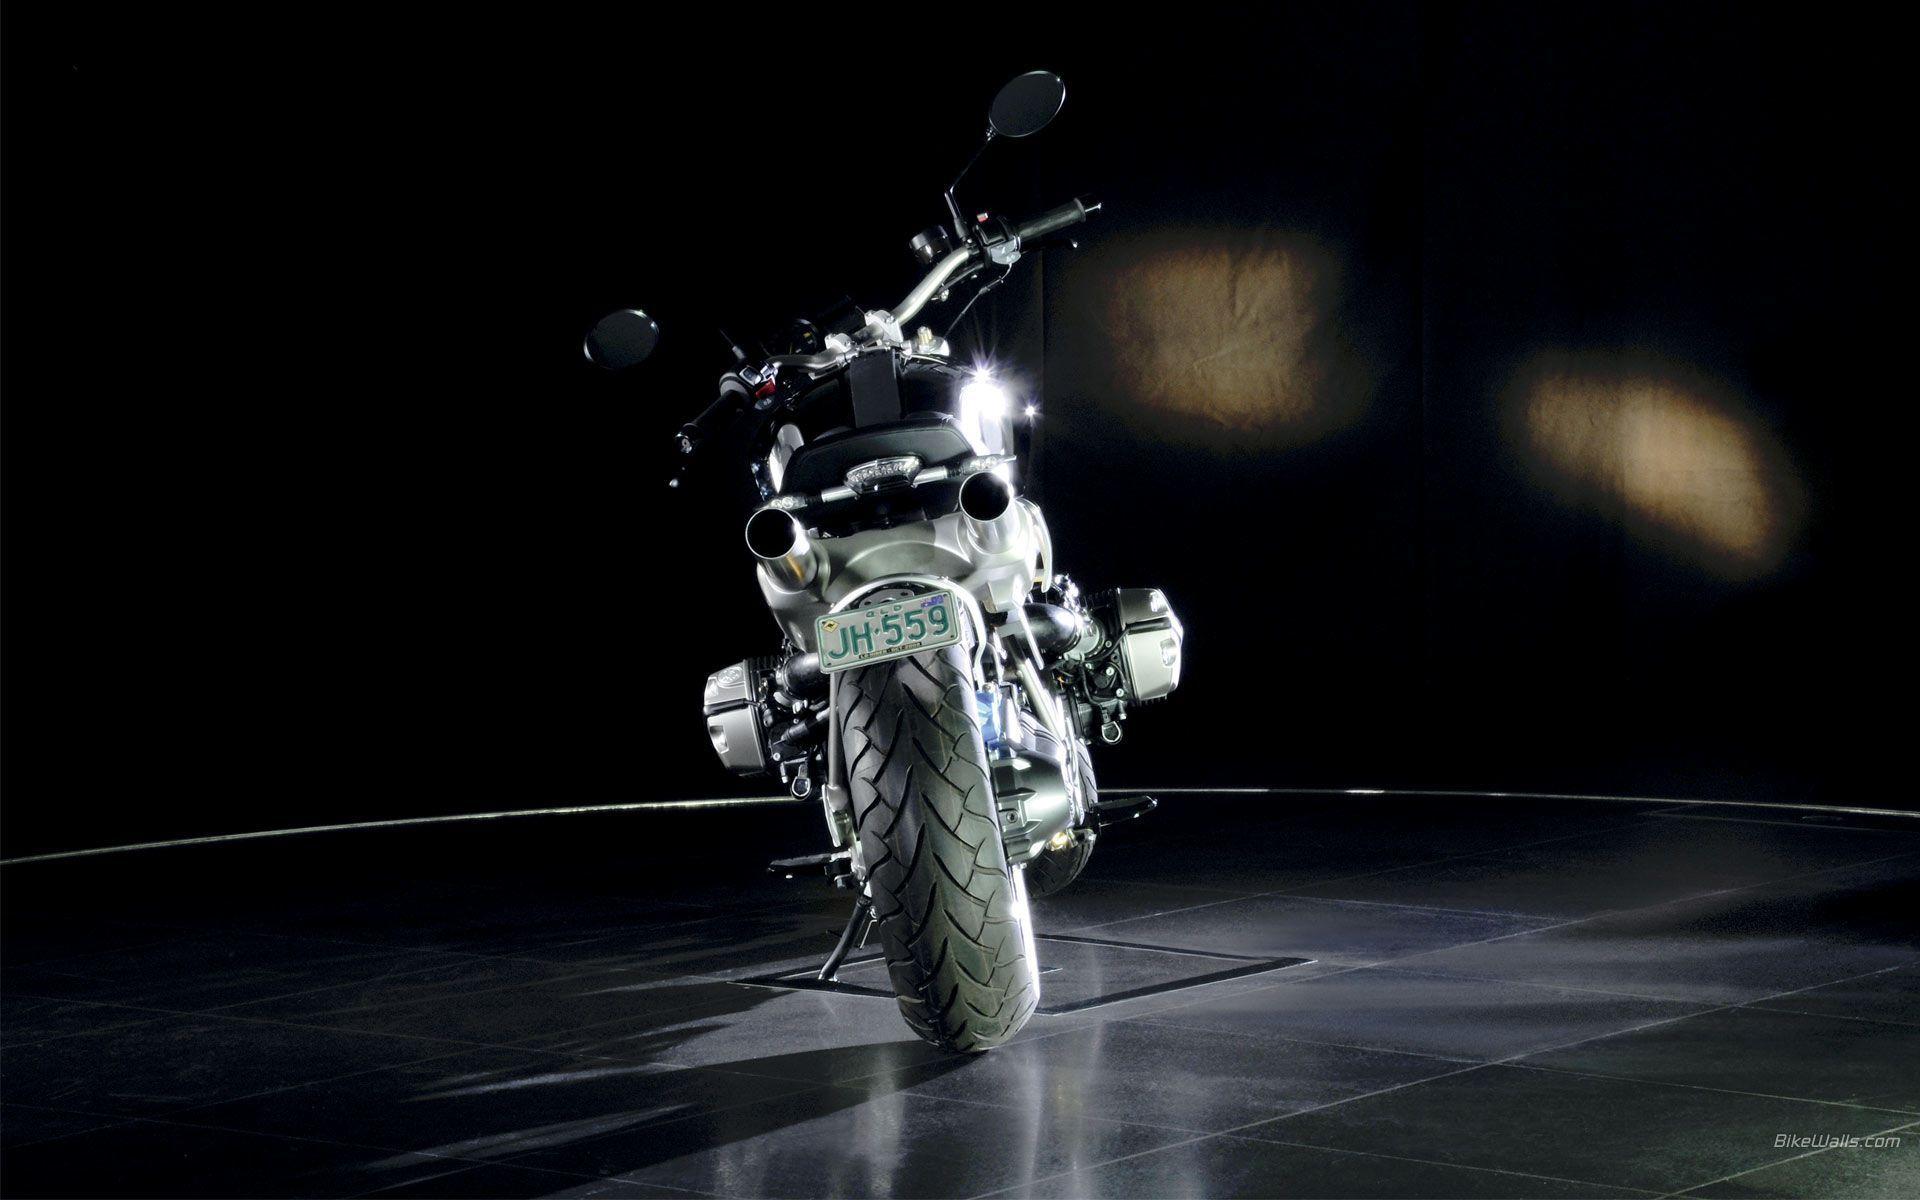 Povinná výbava motocyklu